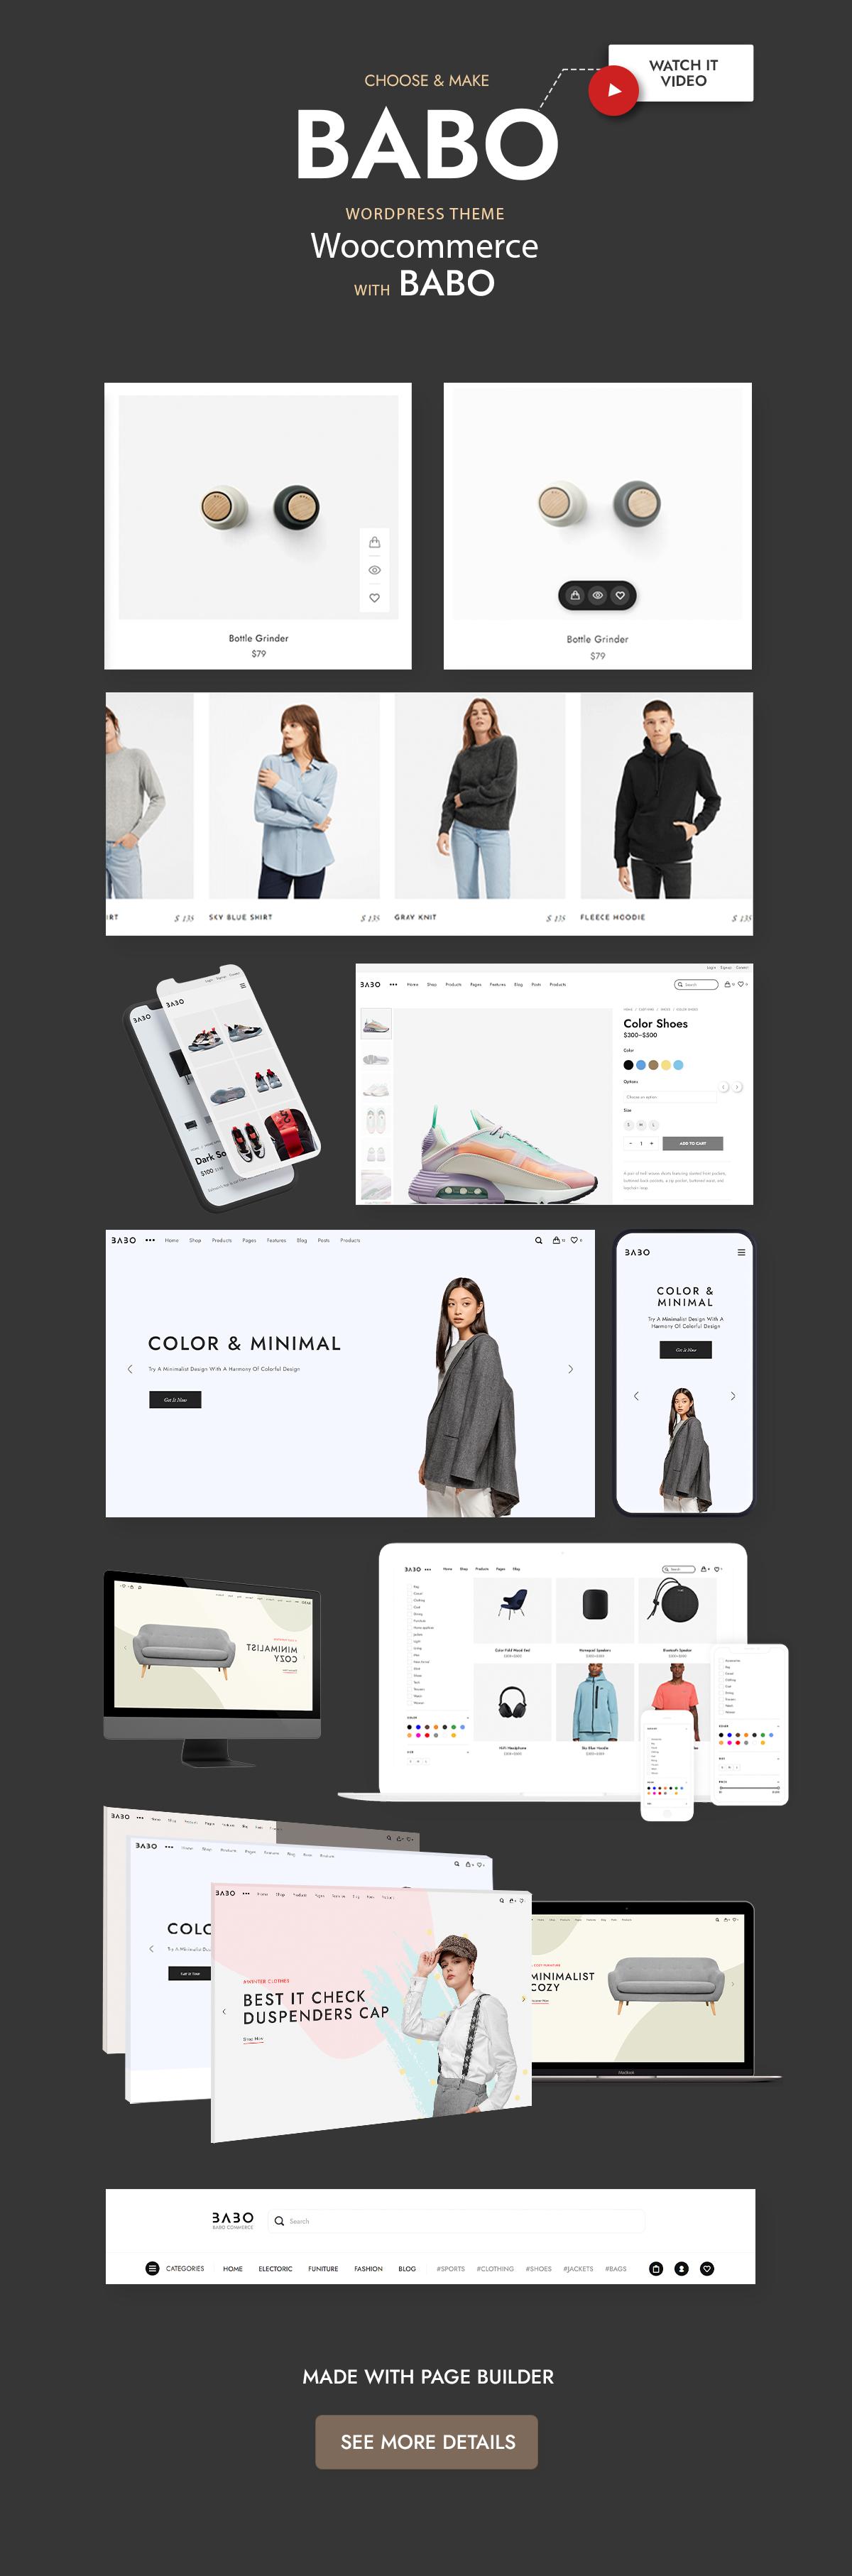 Babo - Modern & Flexible WooCommerce Theme - 3